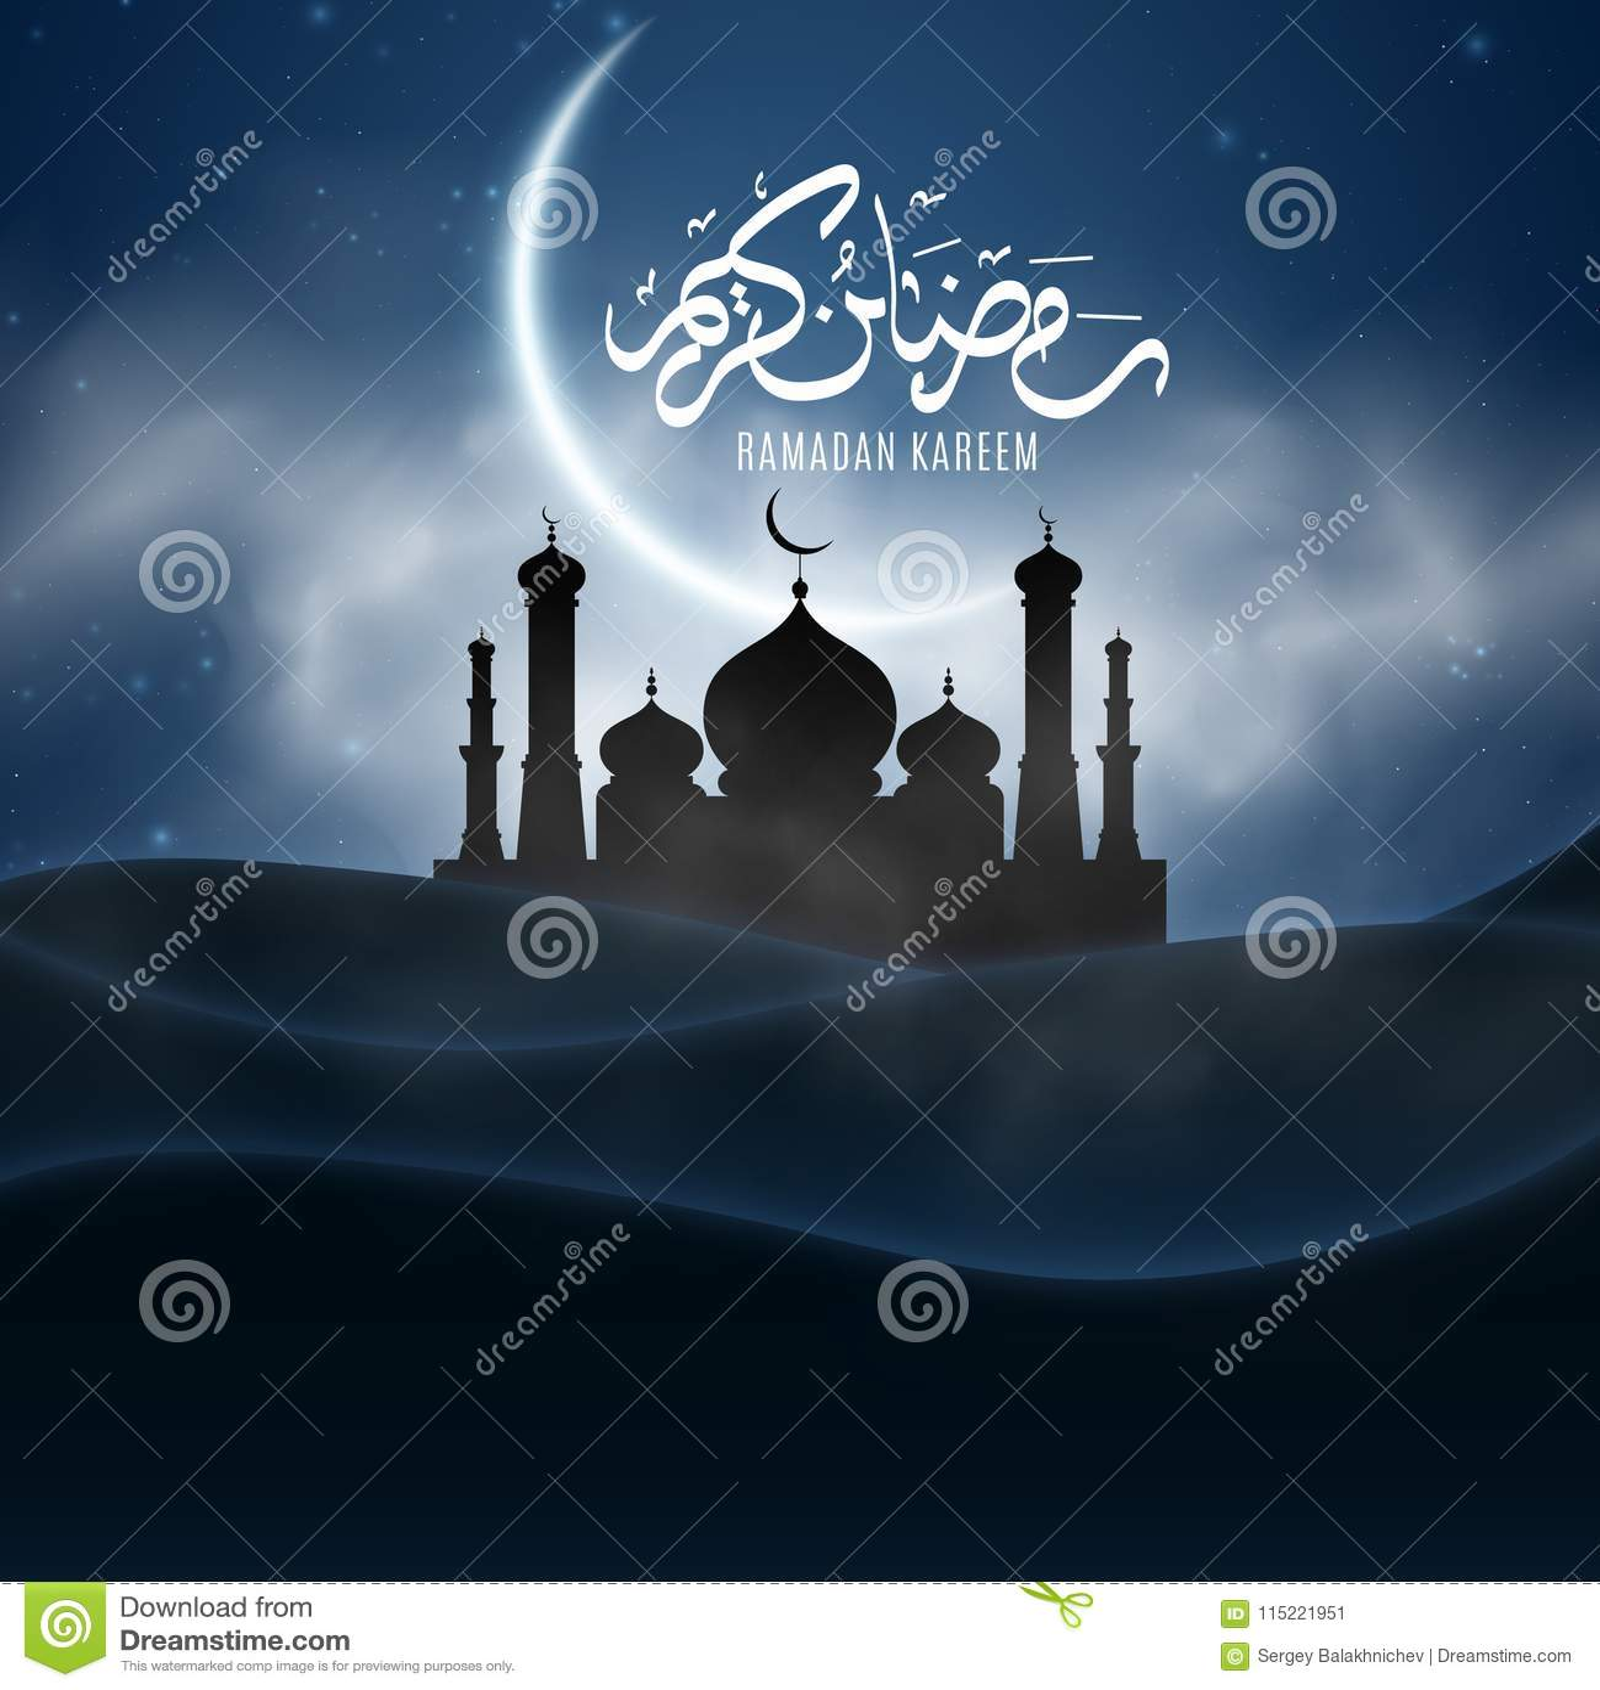 Download Wallpaper For Ramadan Kareem. Religion Holy Month. Hand Drawn Arabic Calligraphy. Bright